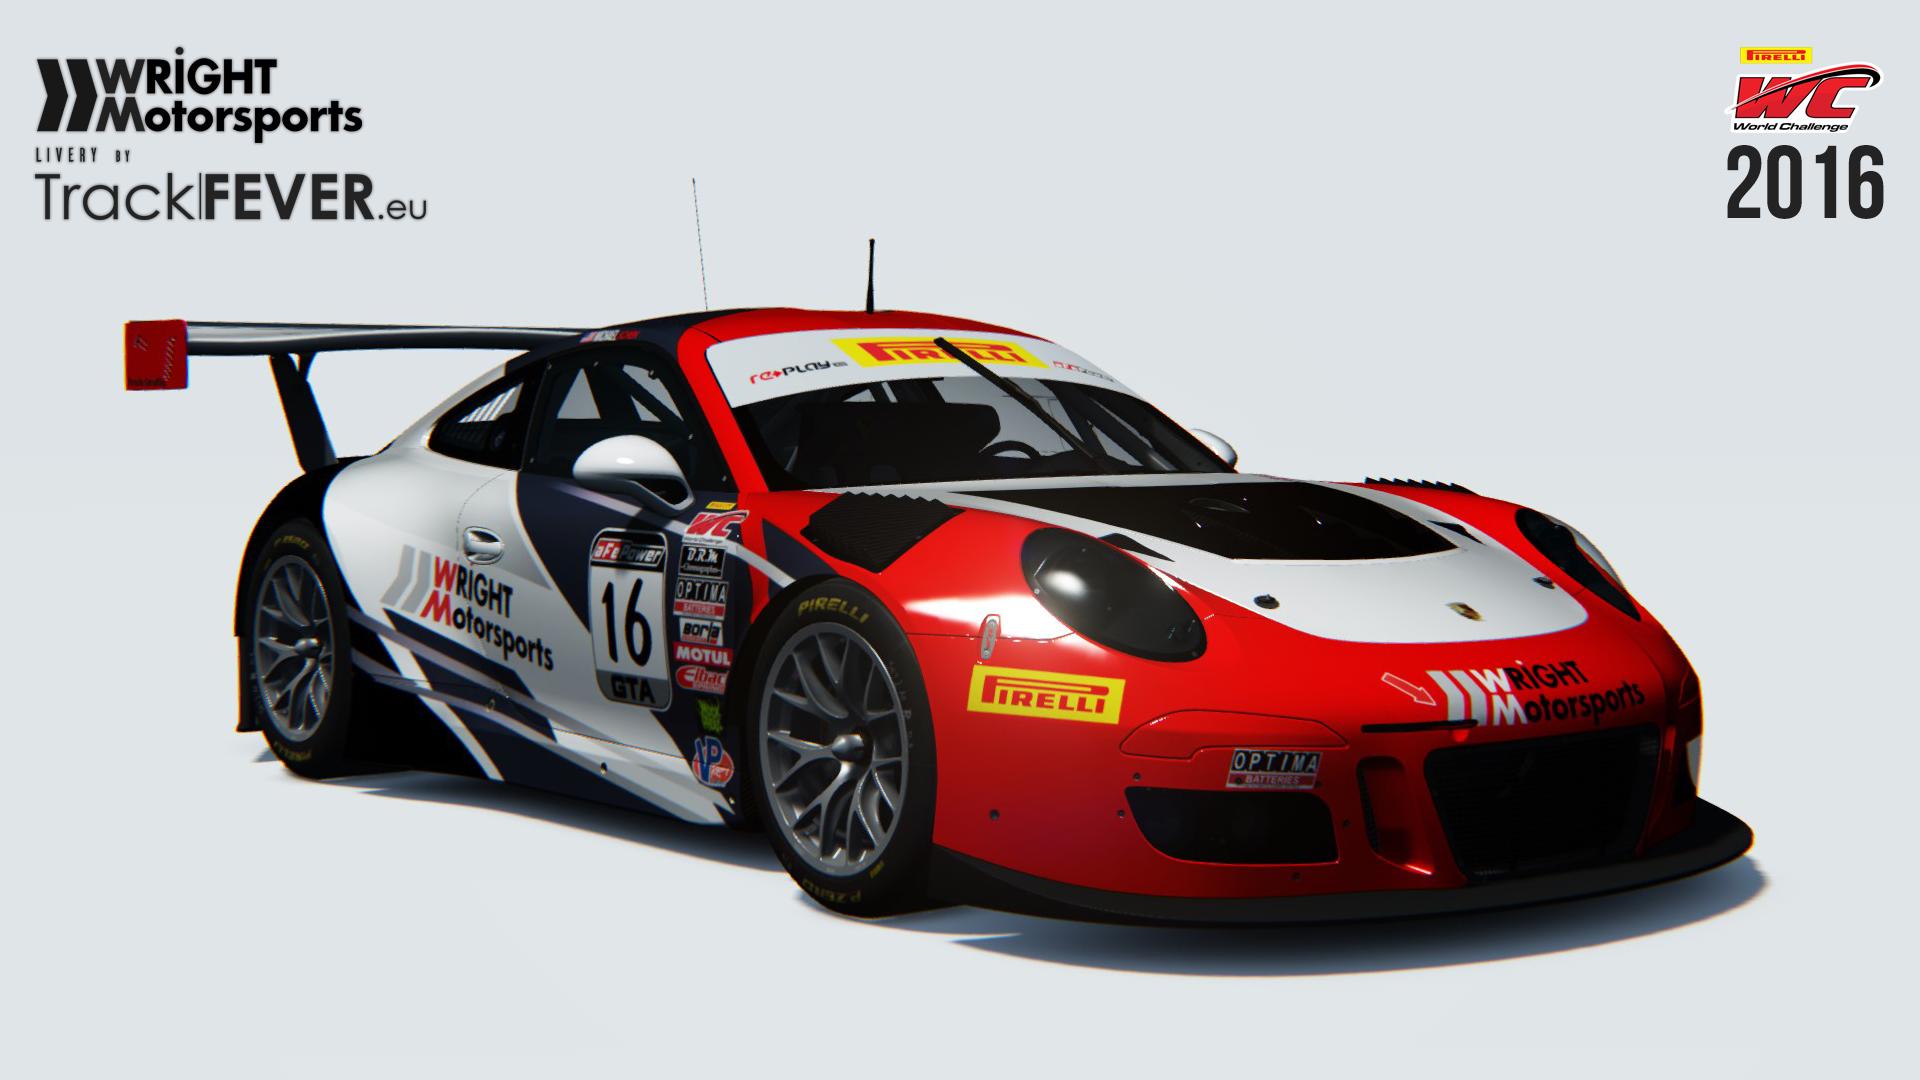 Wright_Motorsport_16_CTMP_1.jpg